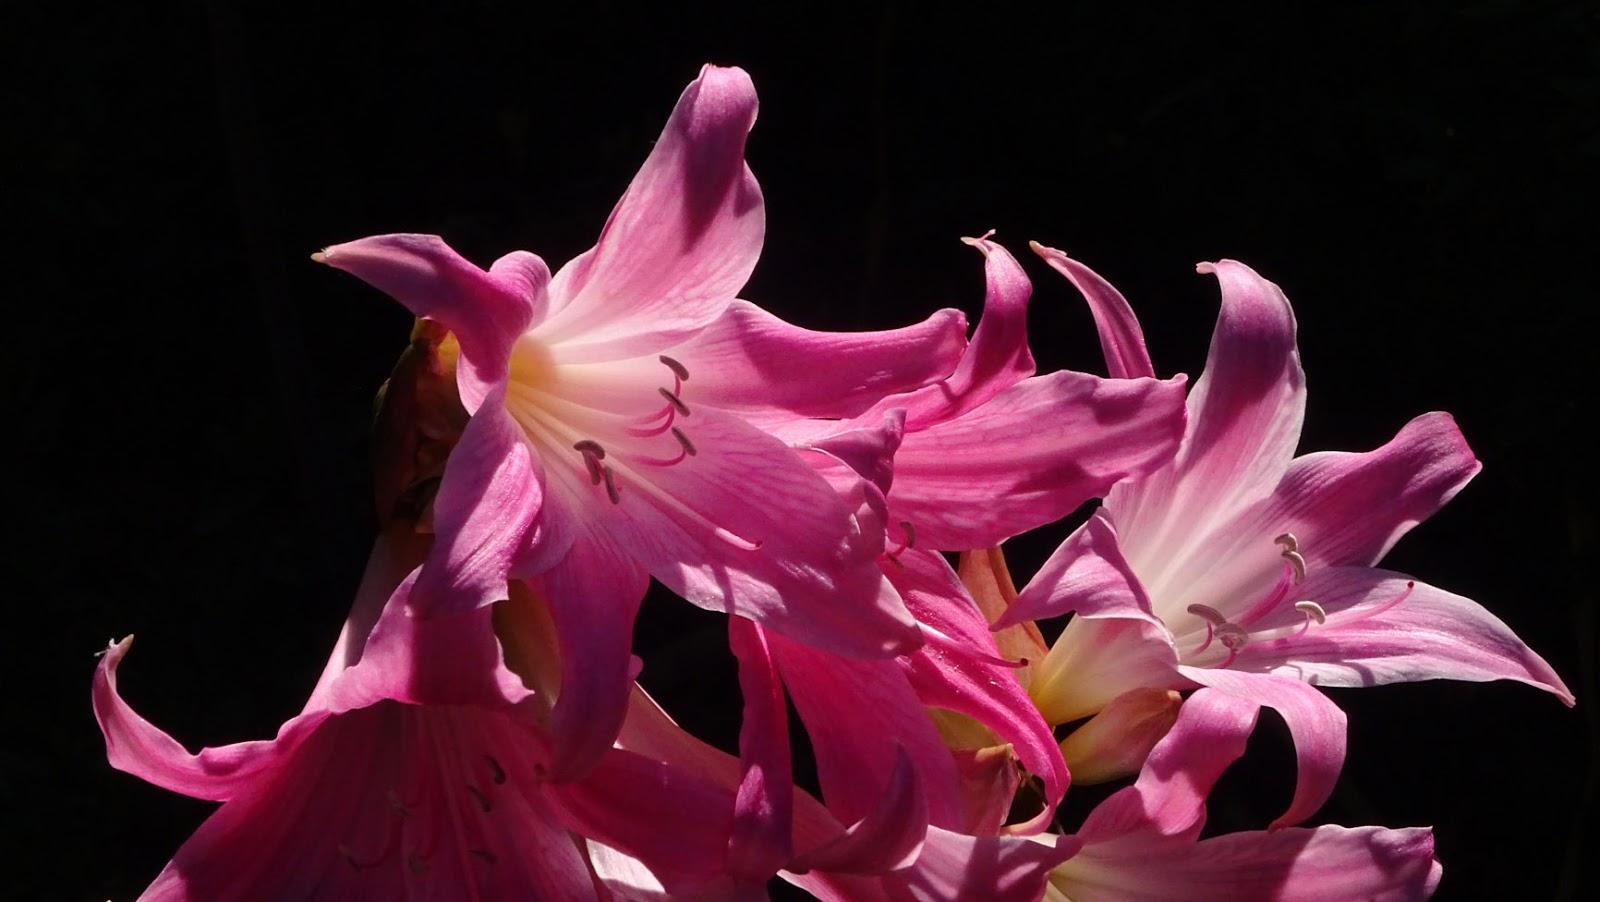 Melbourne Fresh Daily AUTUMN FLOWERS